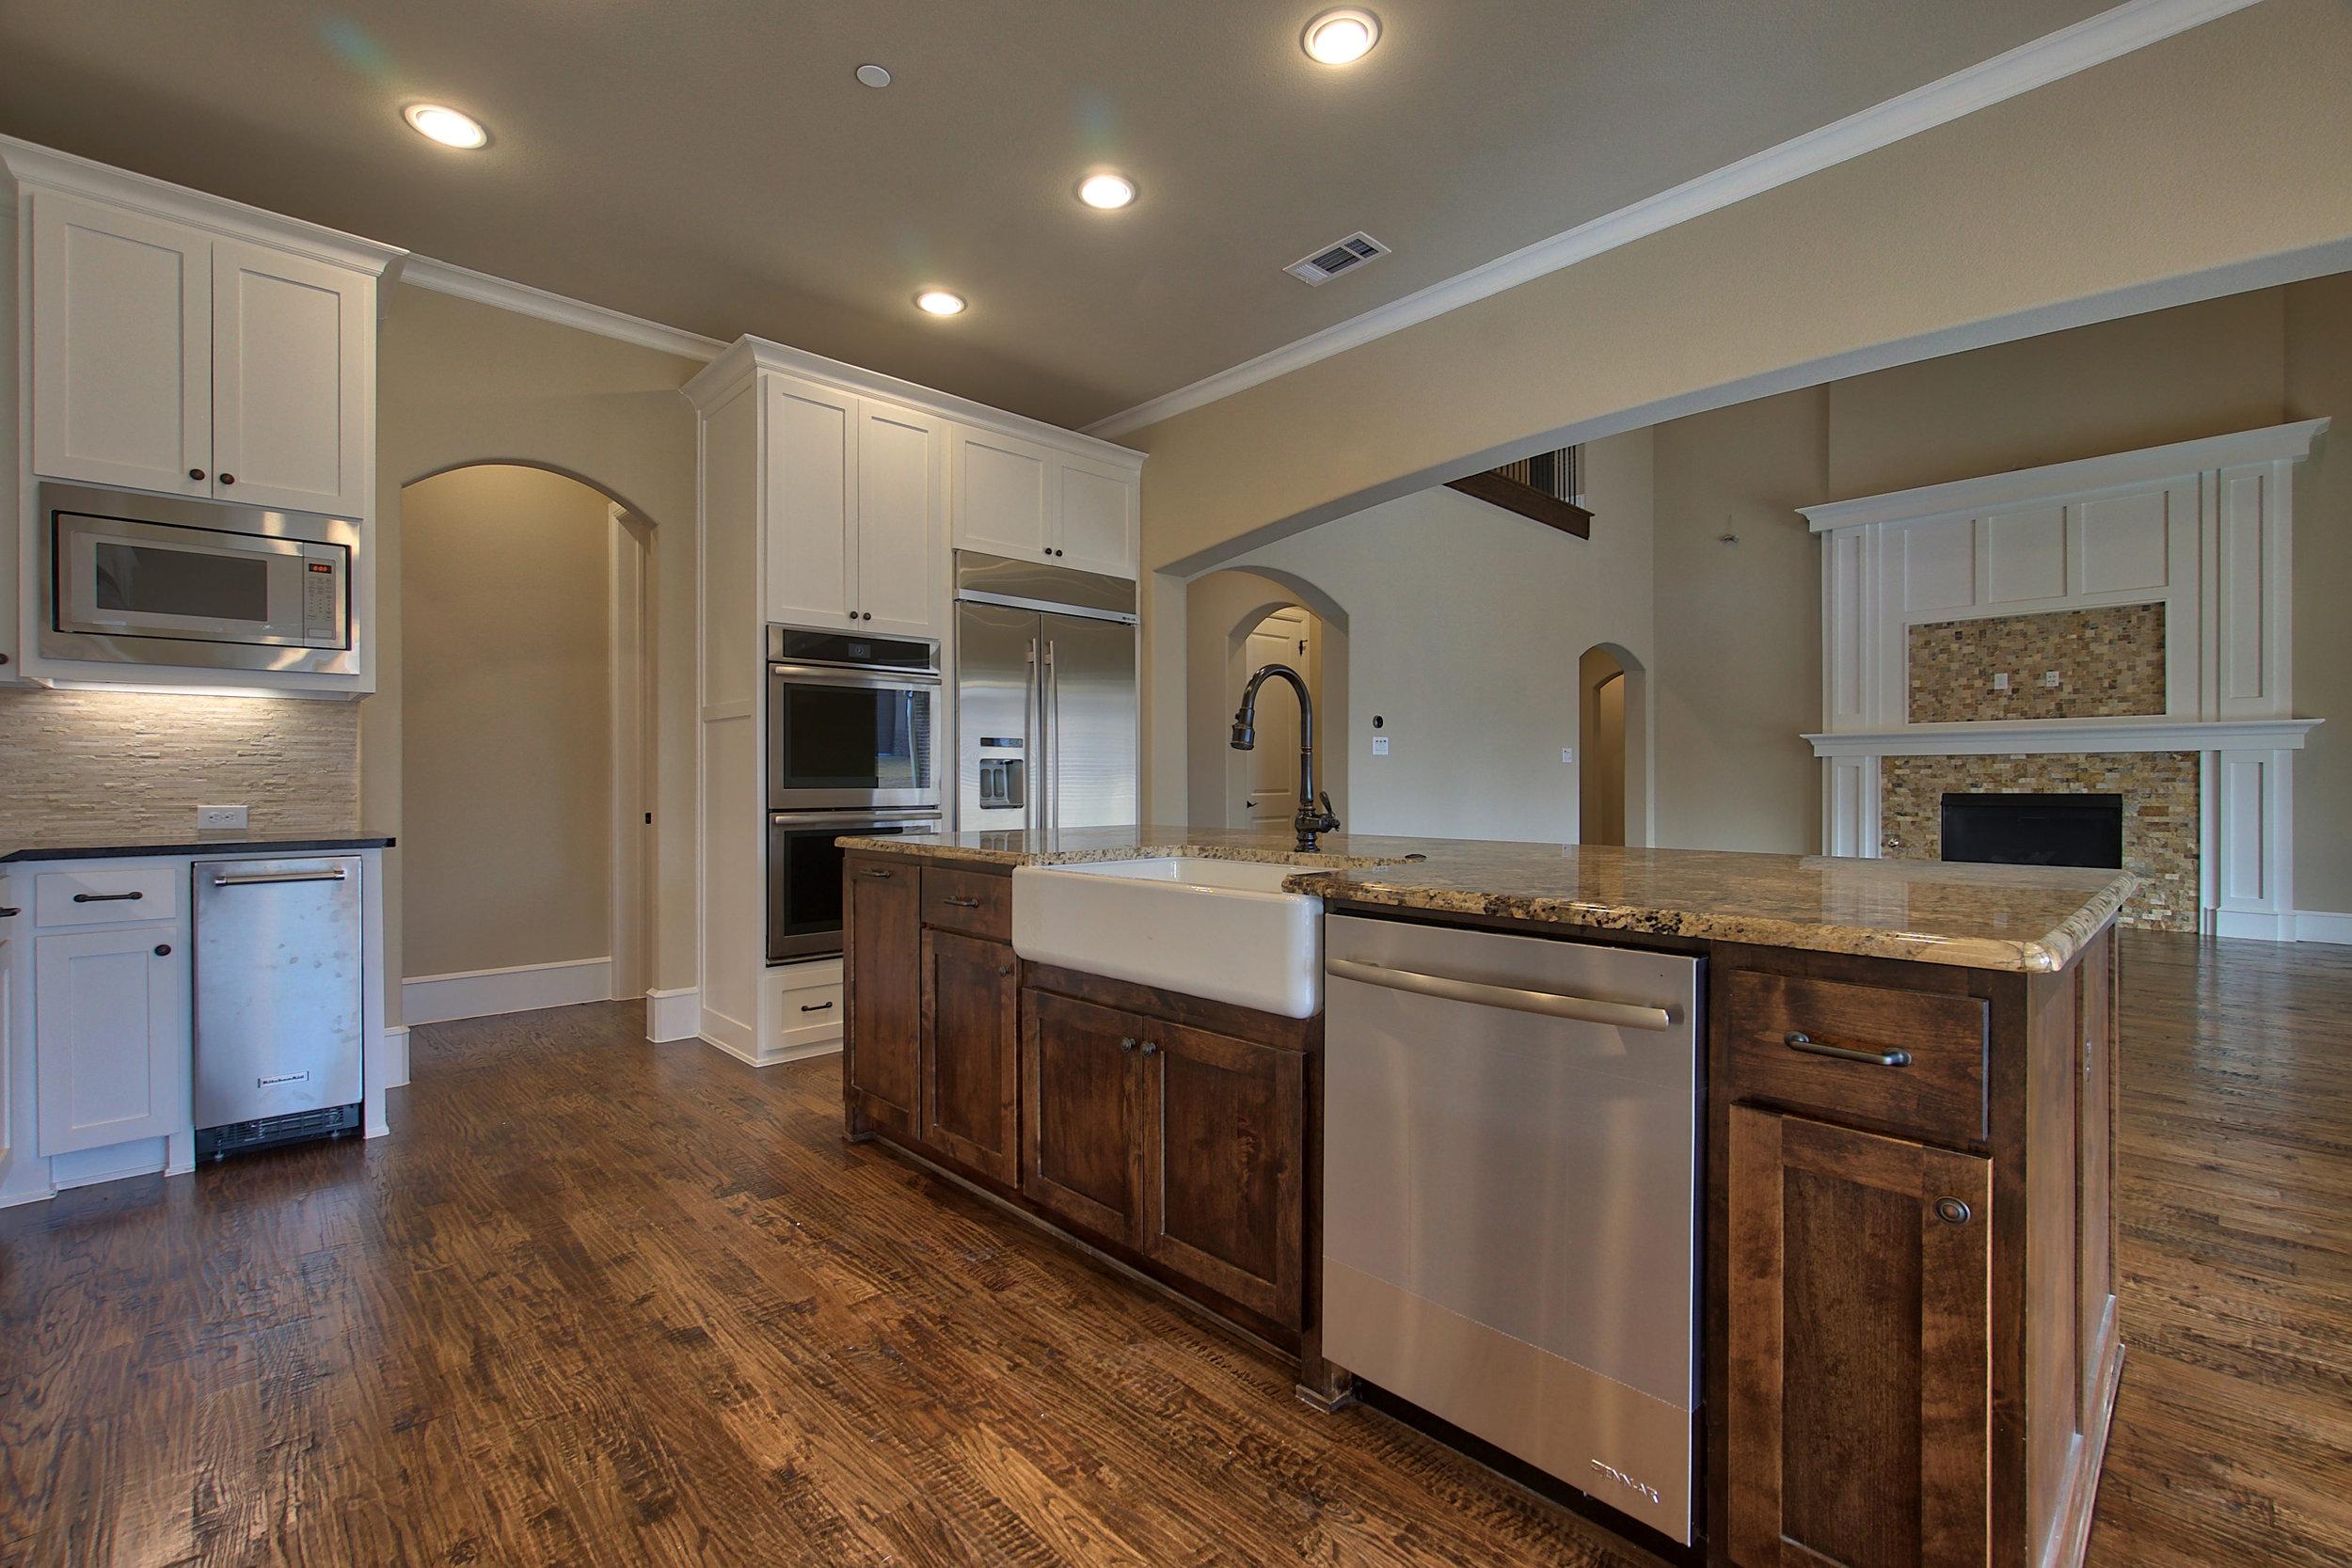 15 kitchen 3.jpeg